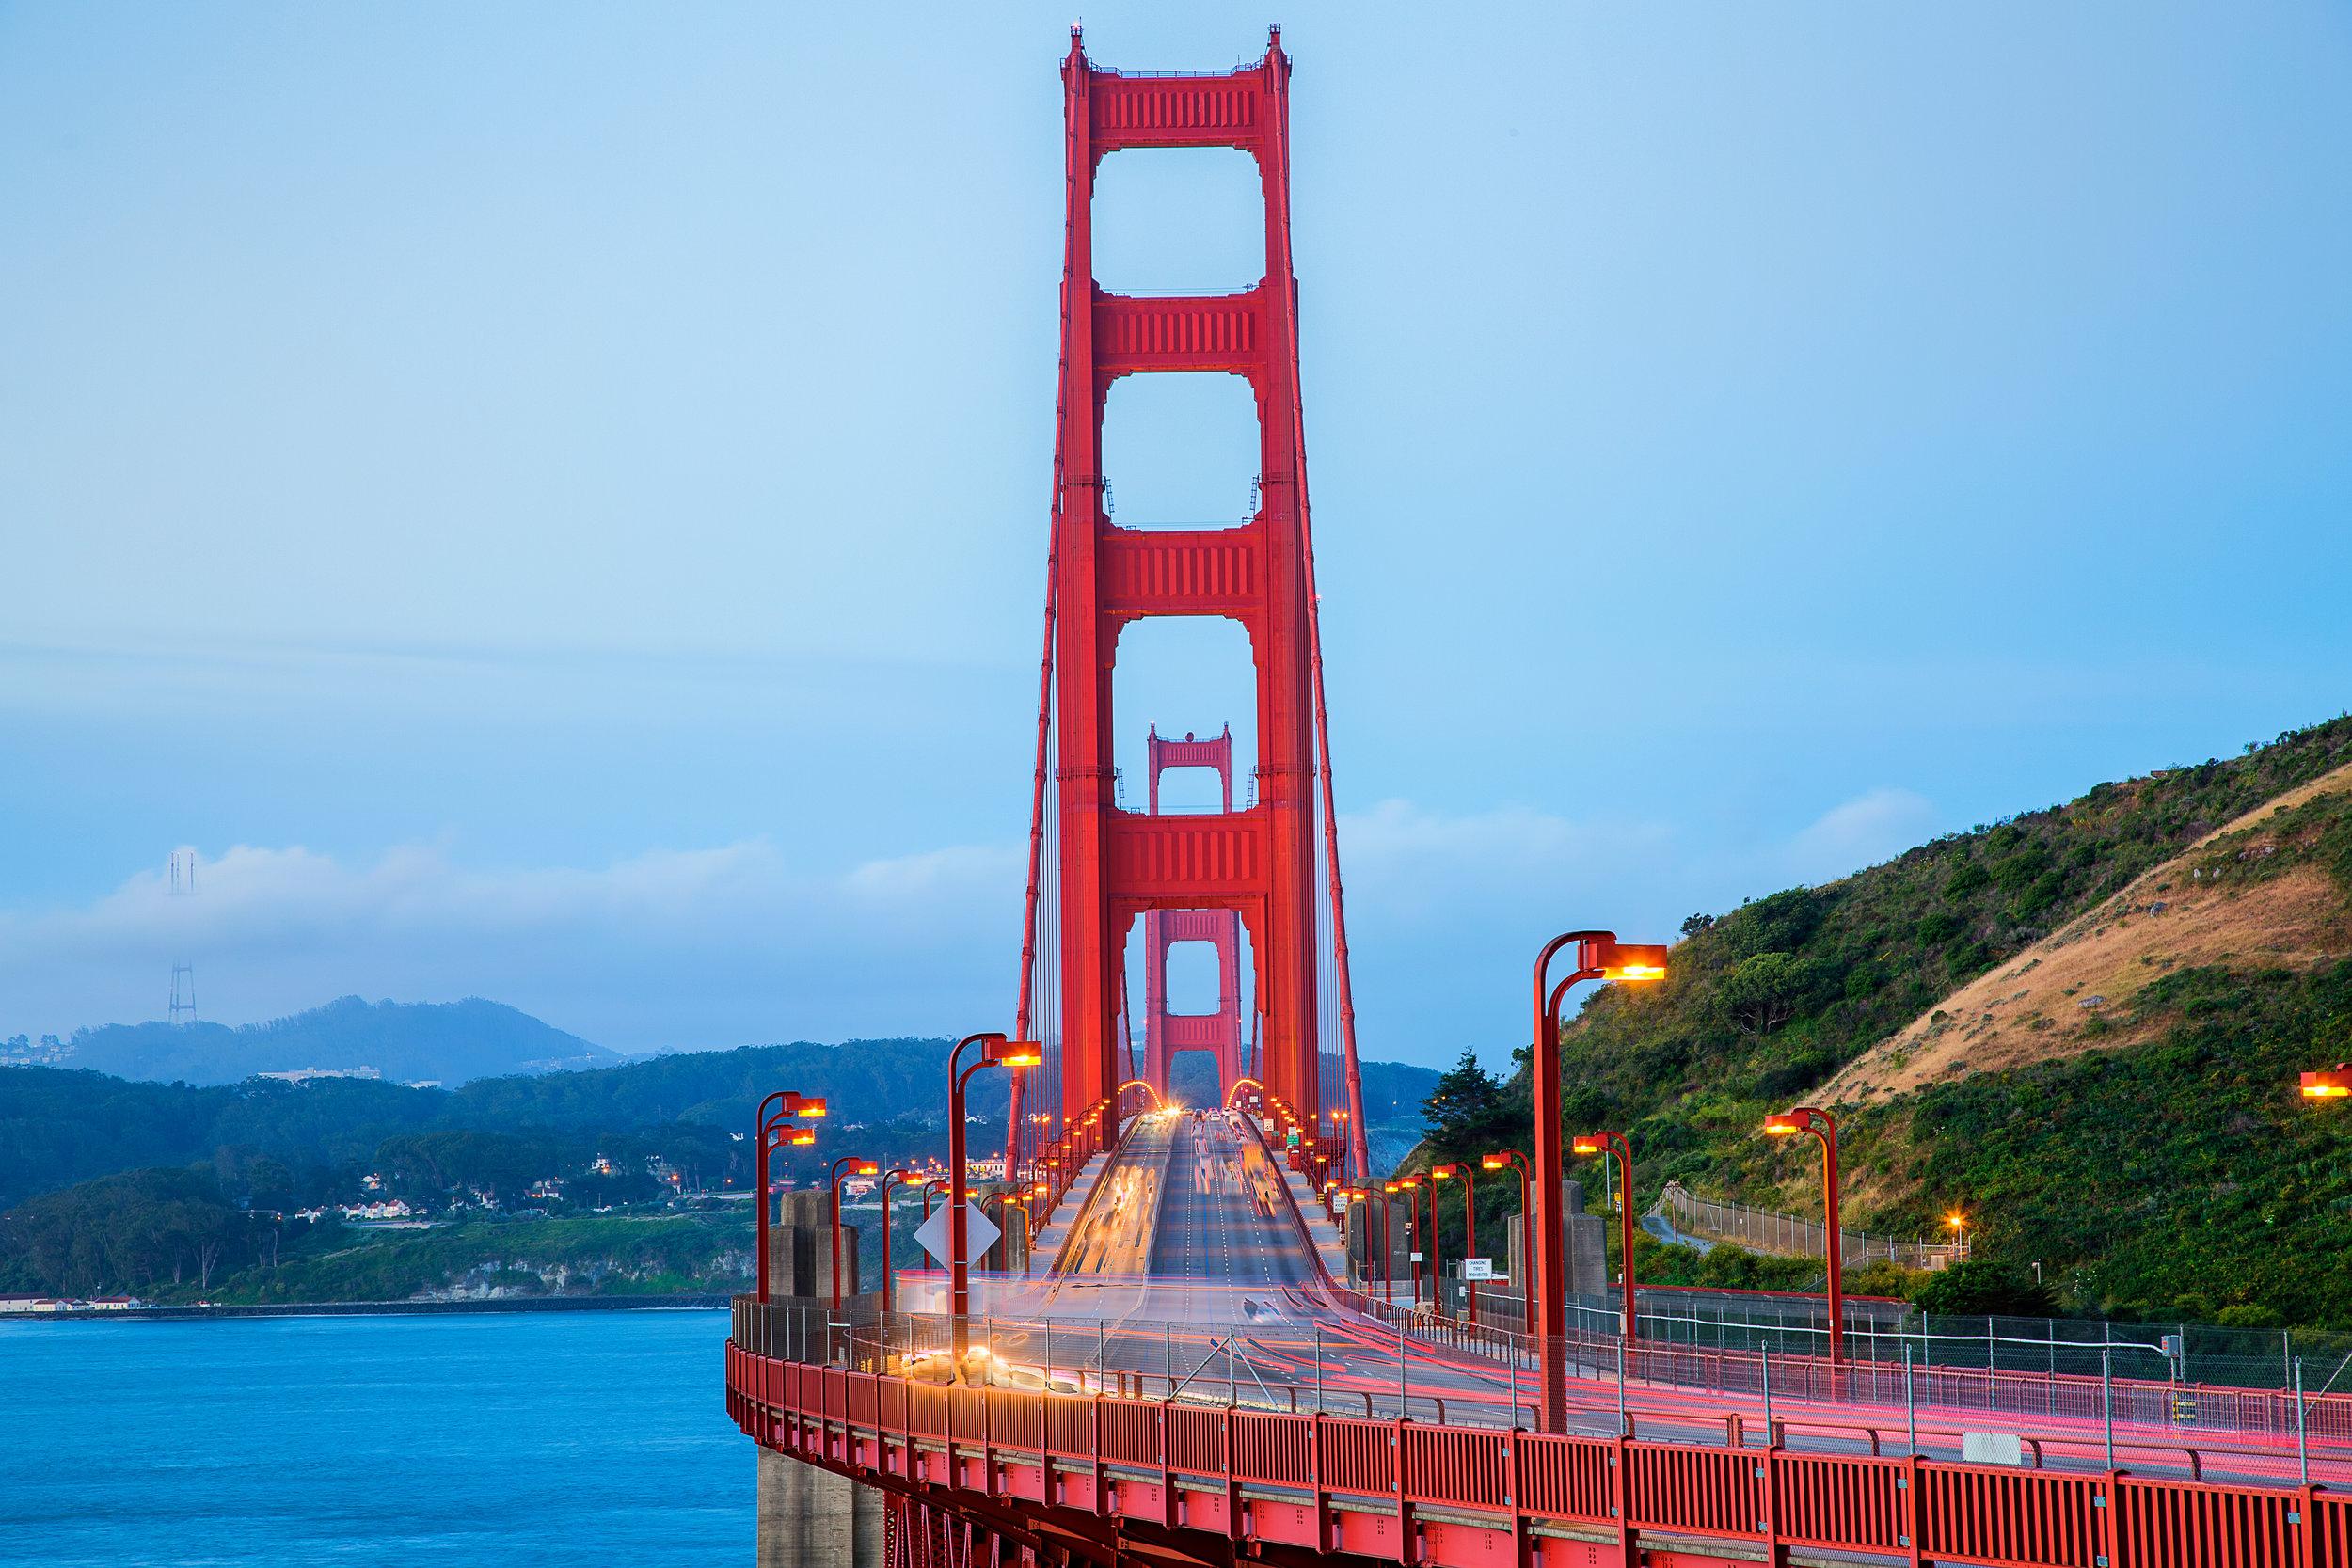 Transportation in San Francisco - Golden Gate Traffic